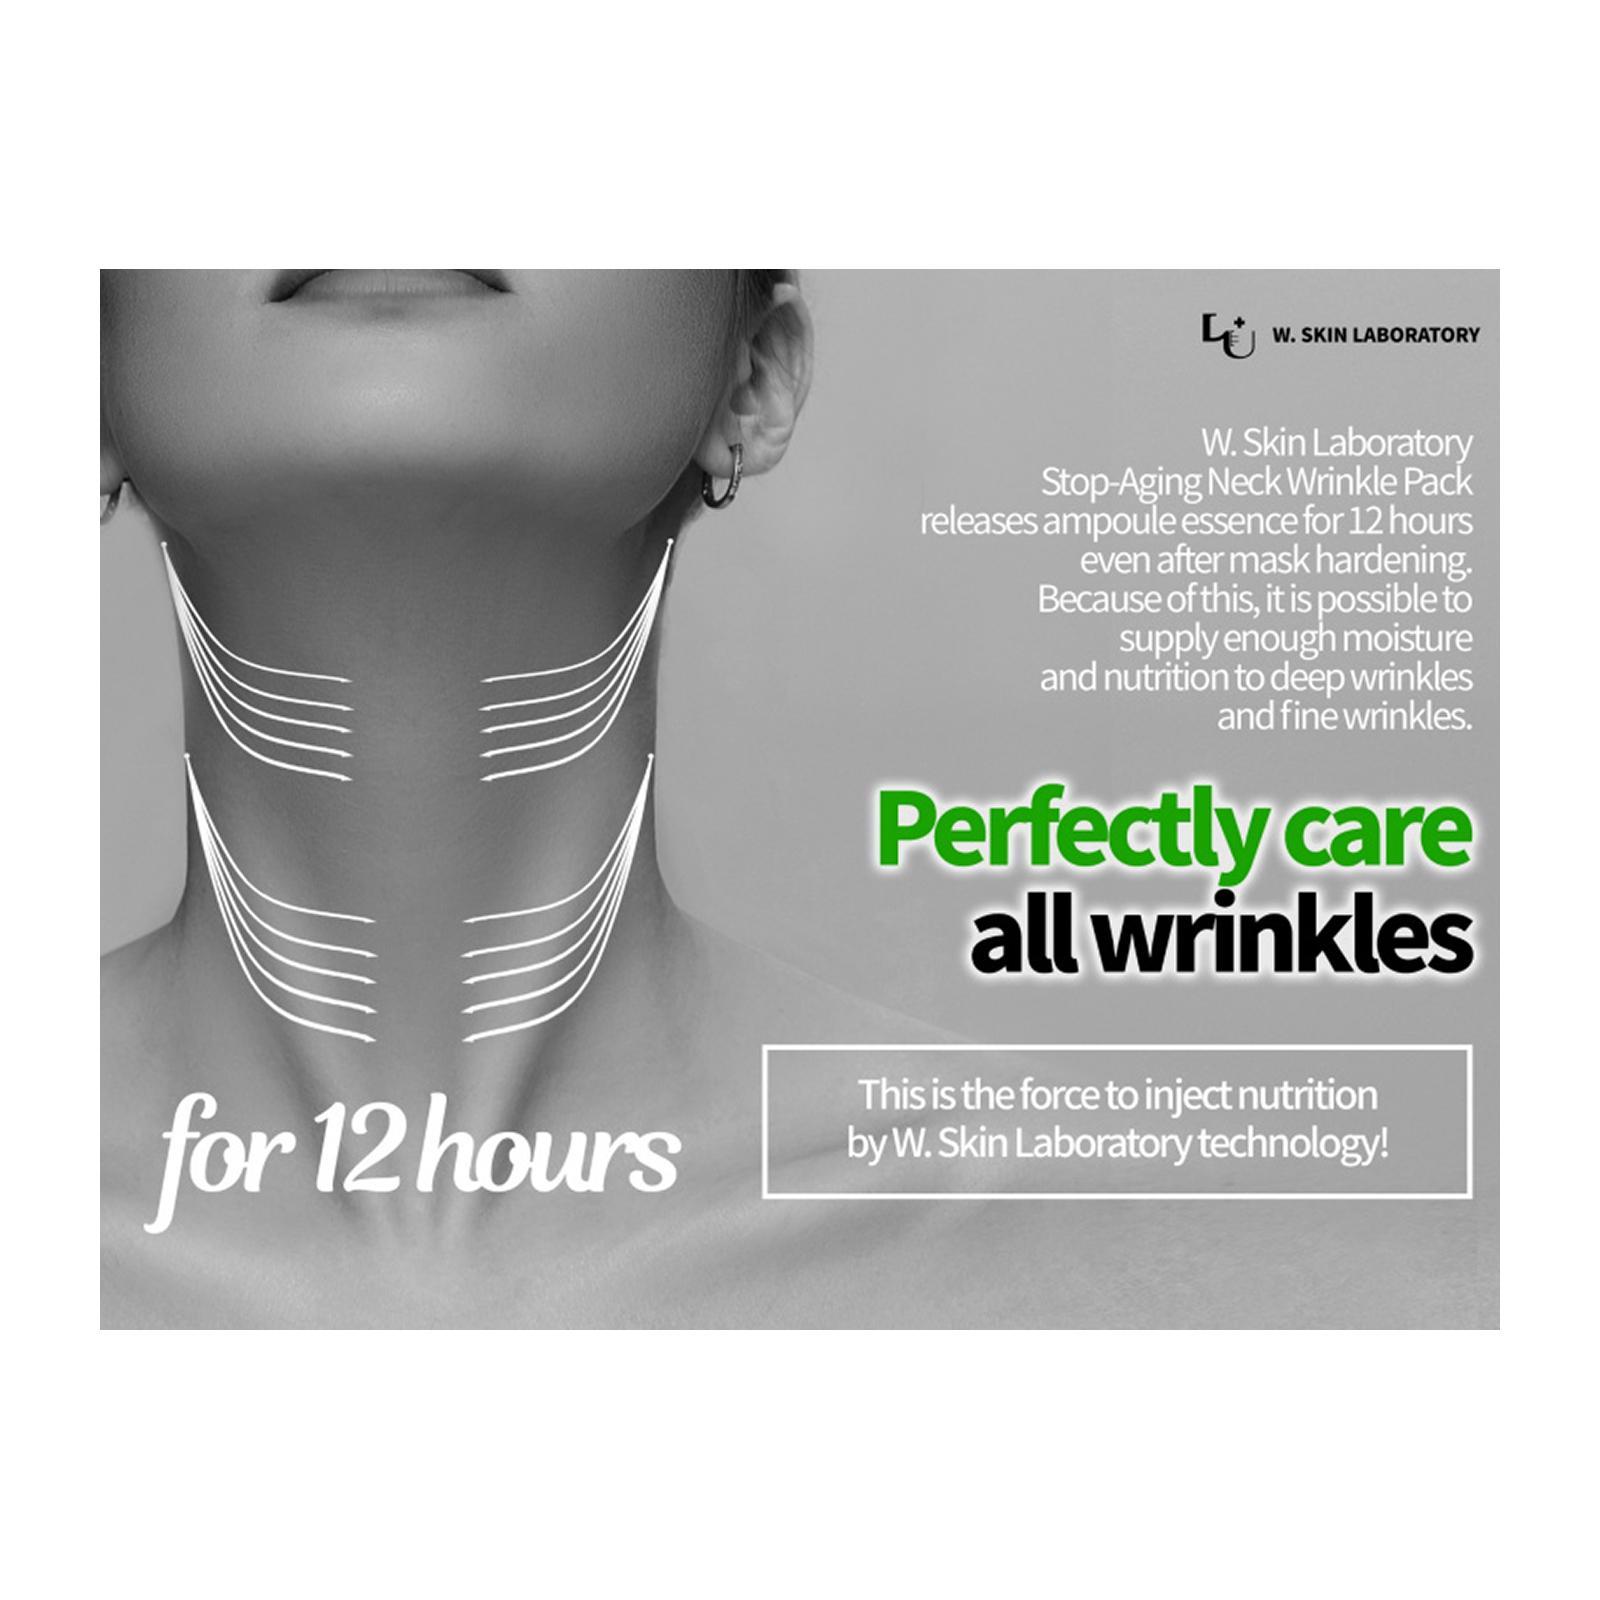 W.Skin Laboratory Peel Off Neck Line Wrinkle Mask Pack